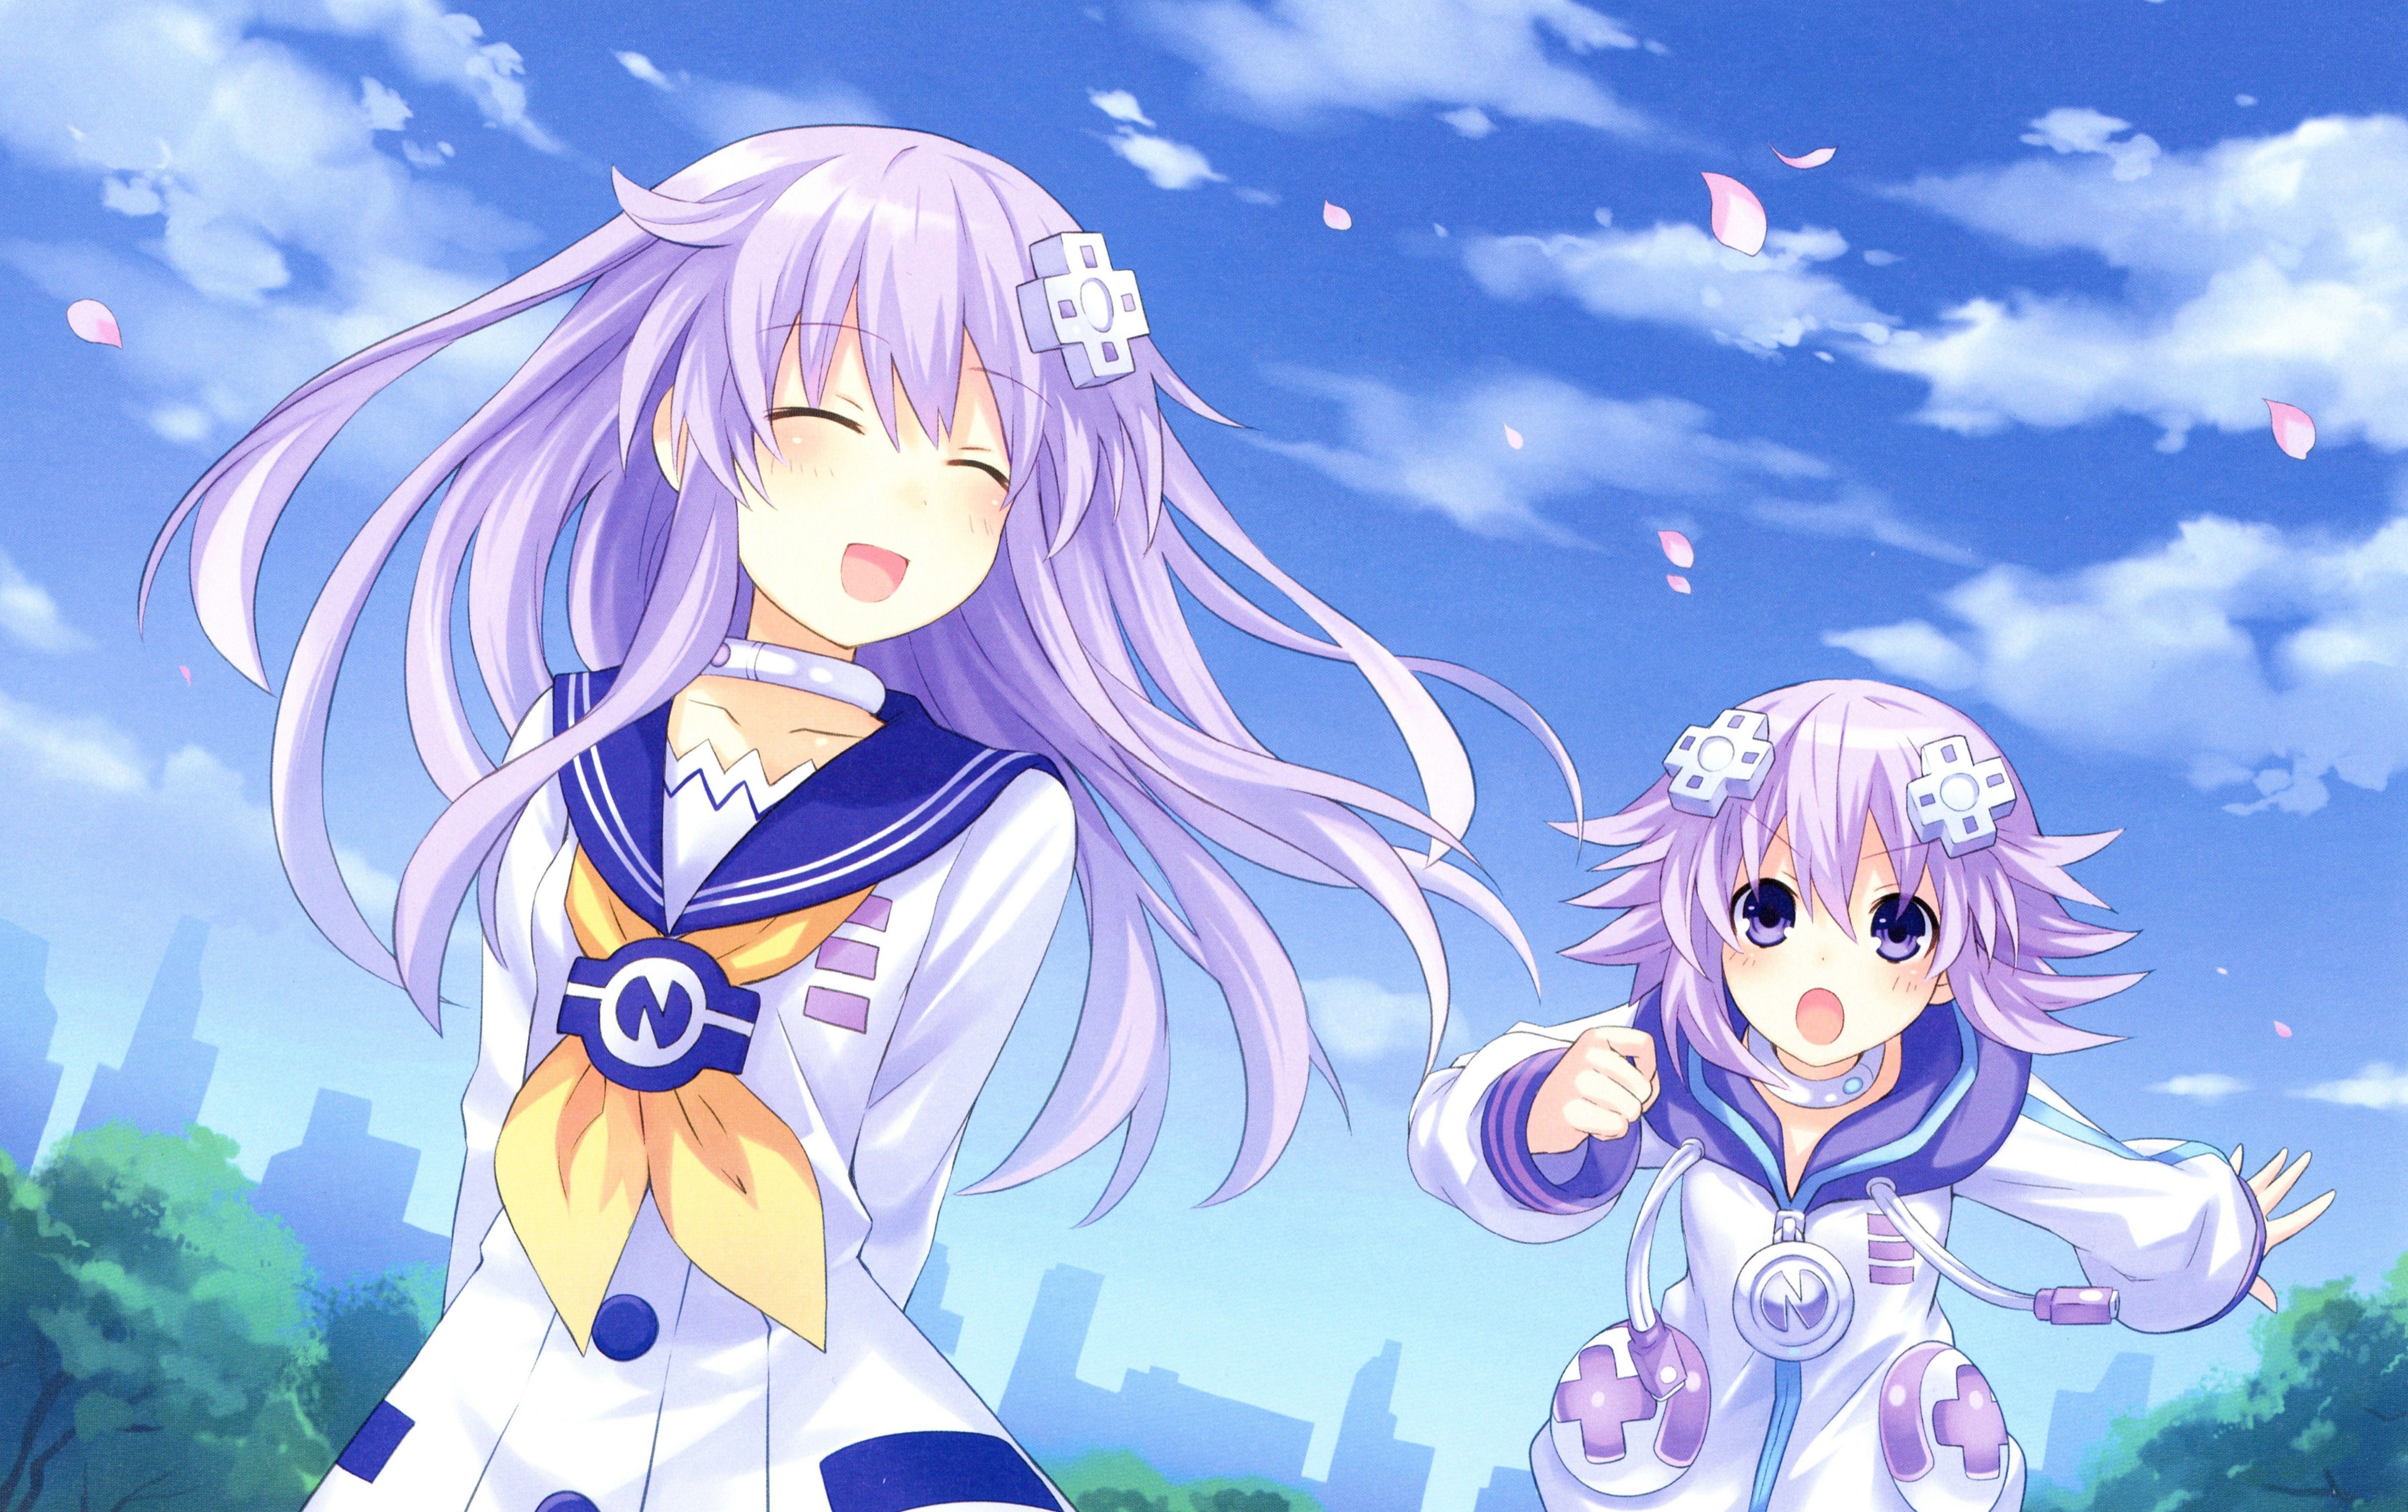 Nepgear x Neptune Anime, Anime art, Animation